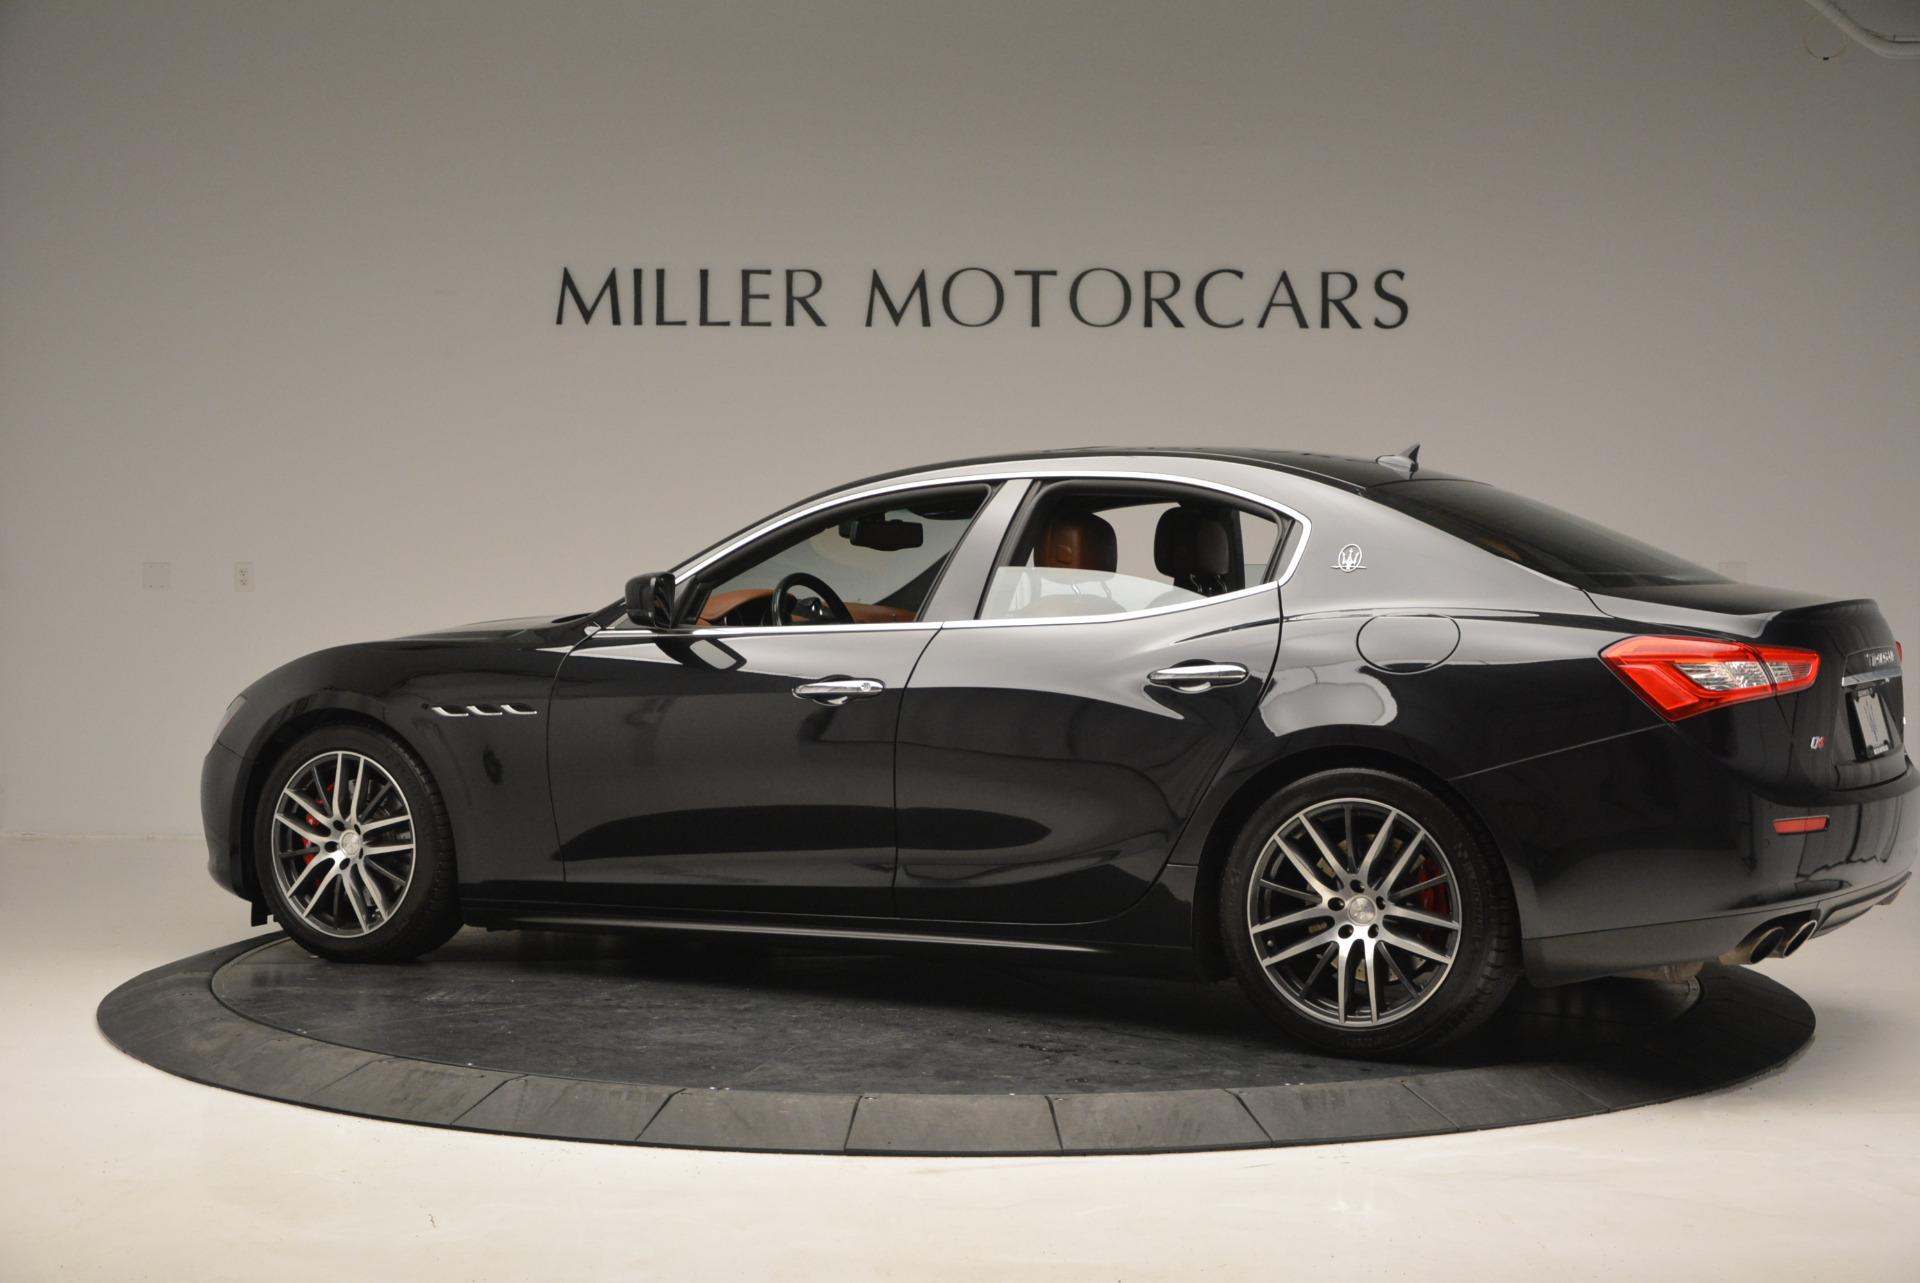 Used 2014 Maserati Ghibli S Q4 For Sale In Greenwich, CT. Alfa Romeo of Greenwich, 7132 805_p4